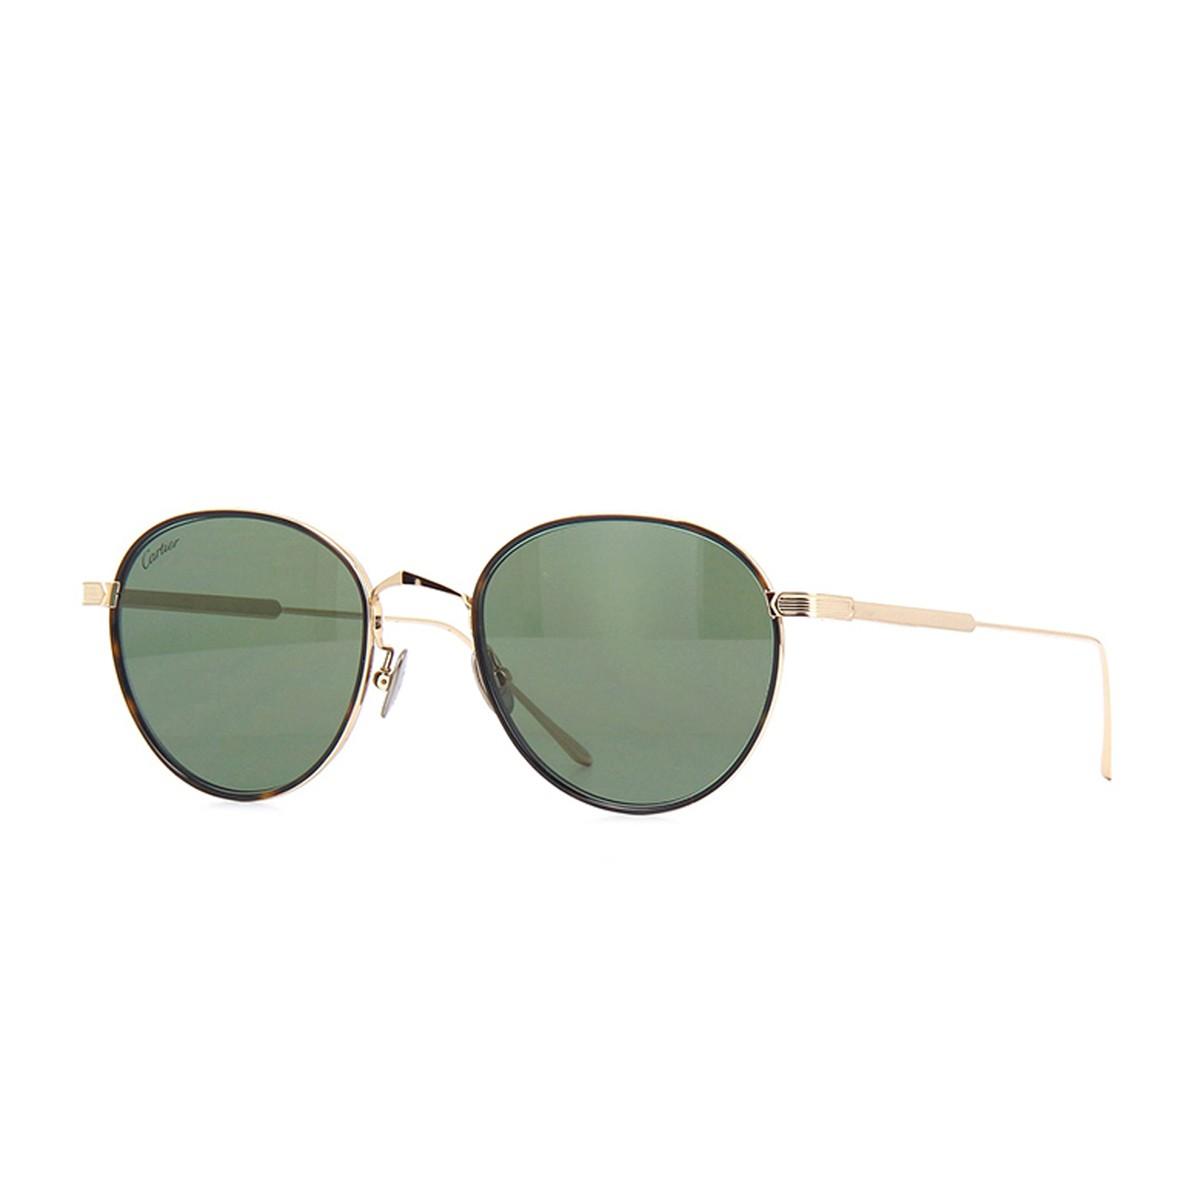 Cartier CT0250S | Unisex sunglasses